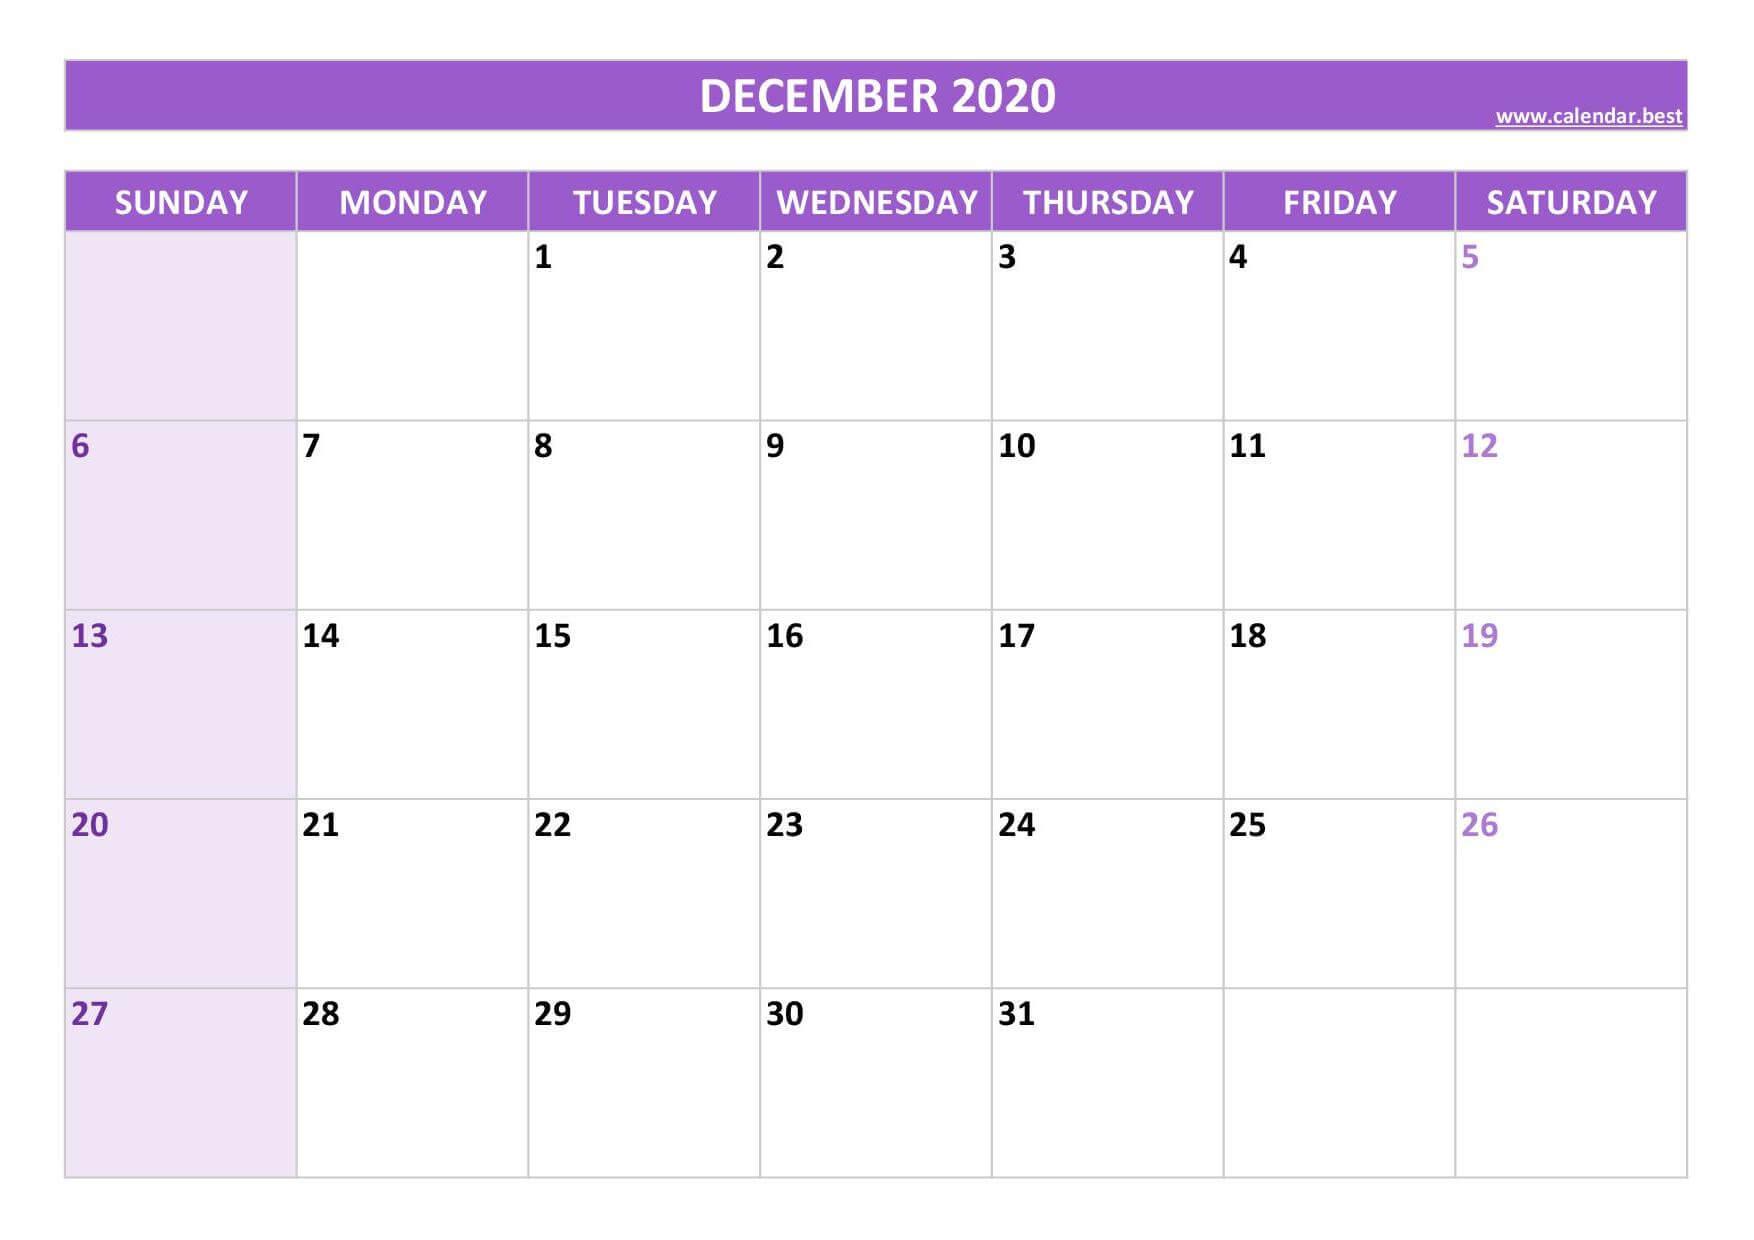 December 2020 Calendar Download